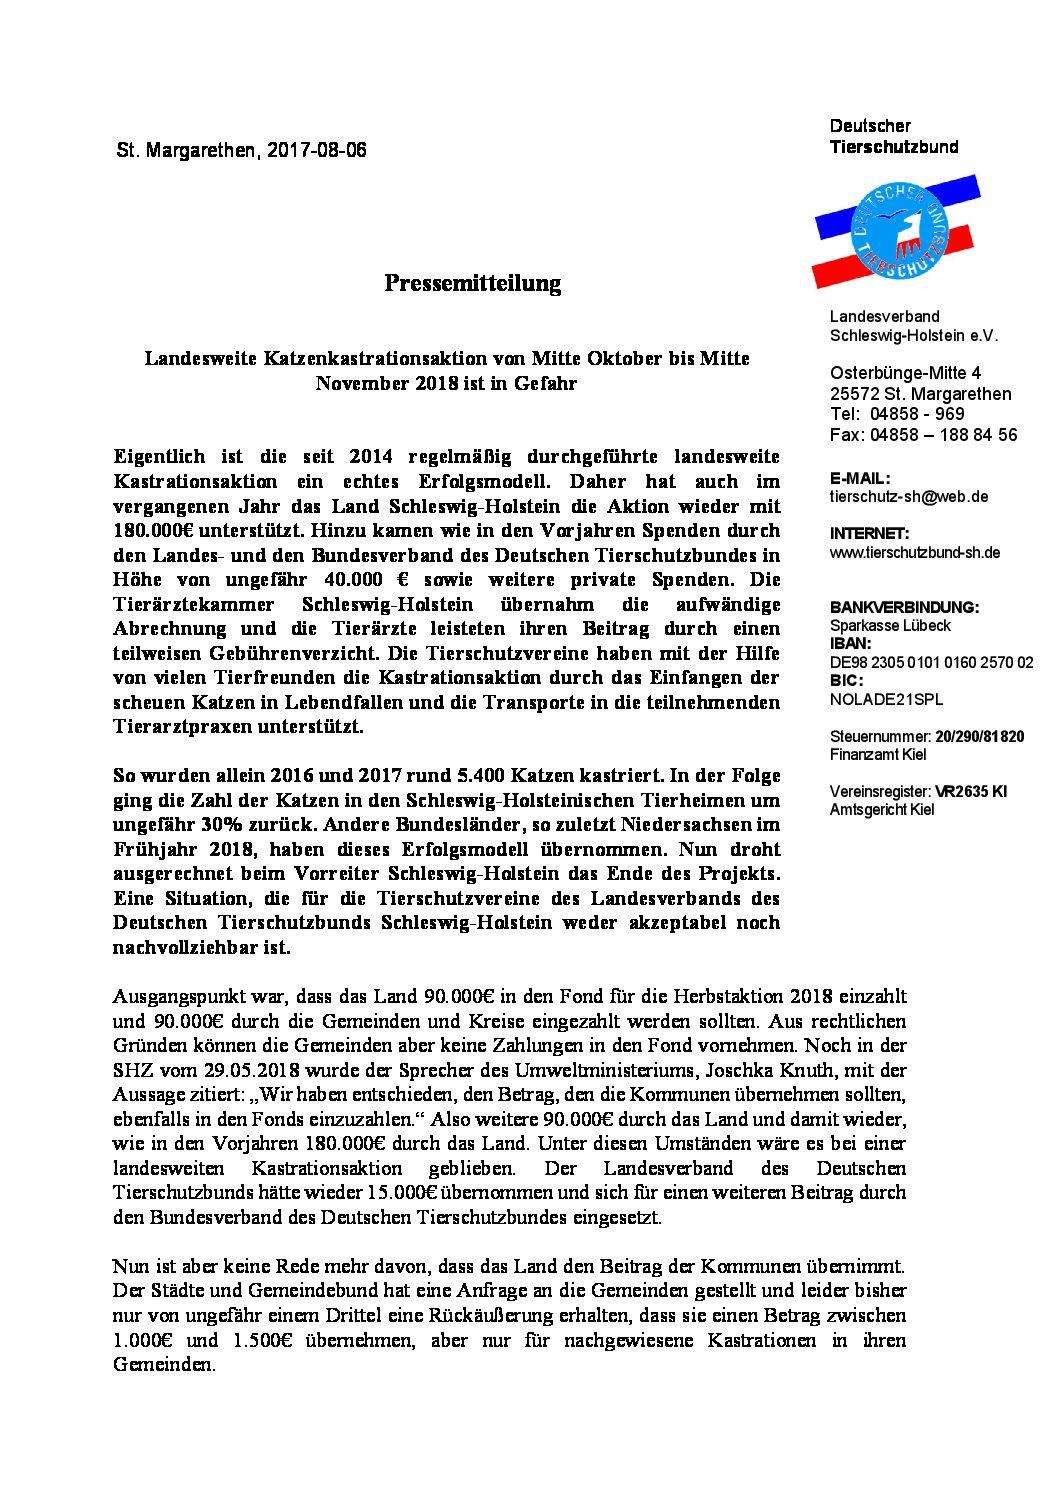 Pressemitteilung wg. Kastrationsaktion 2018